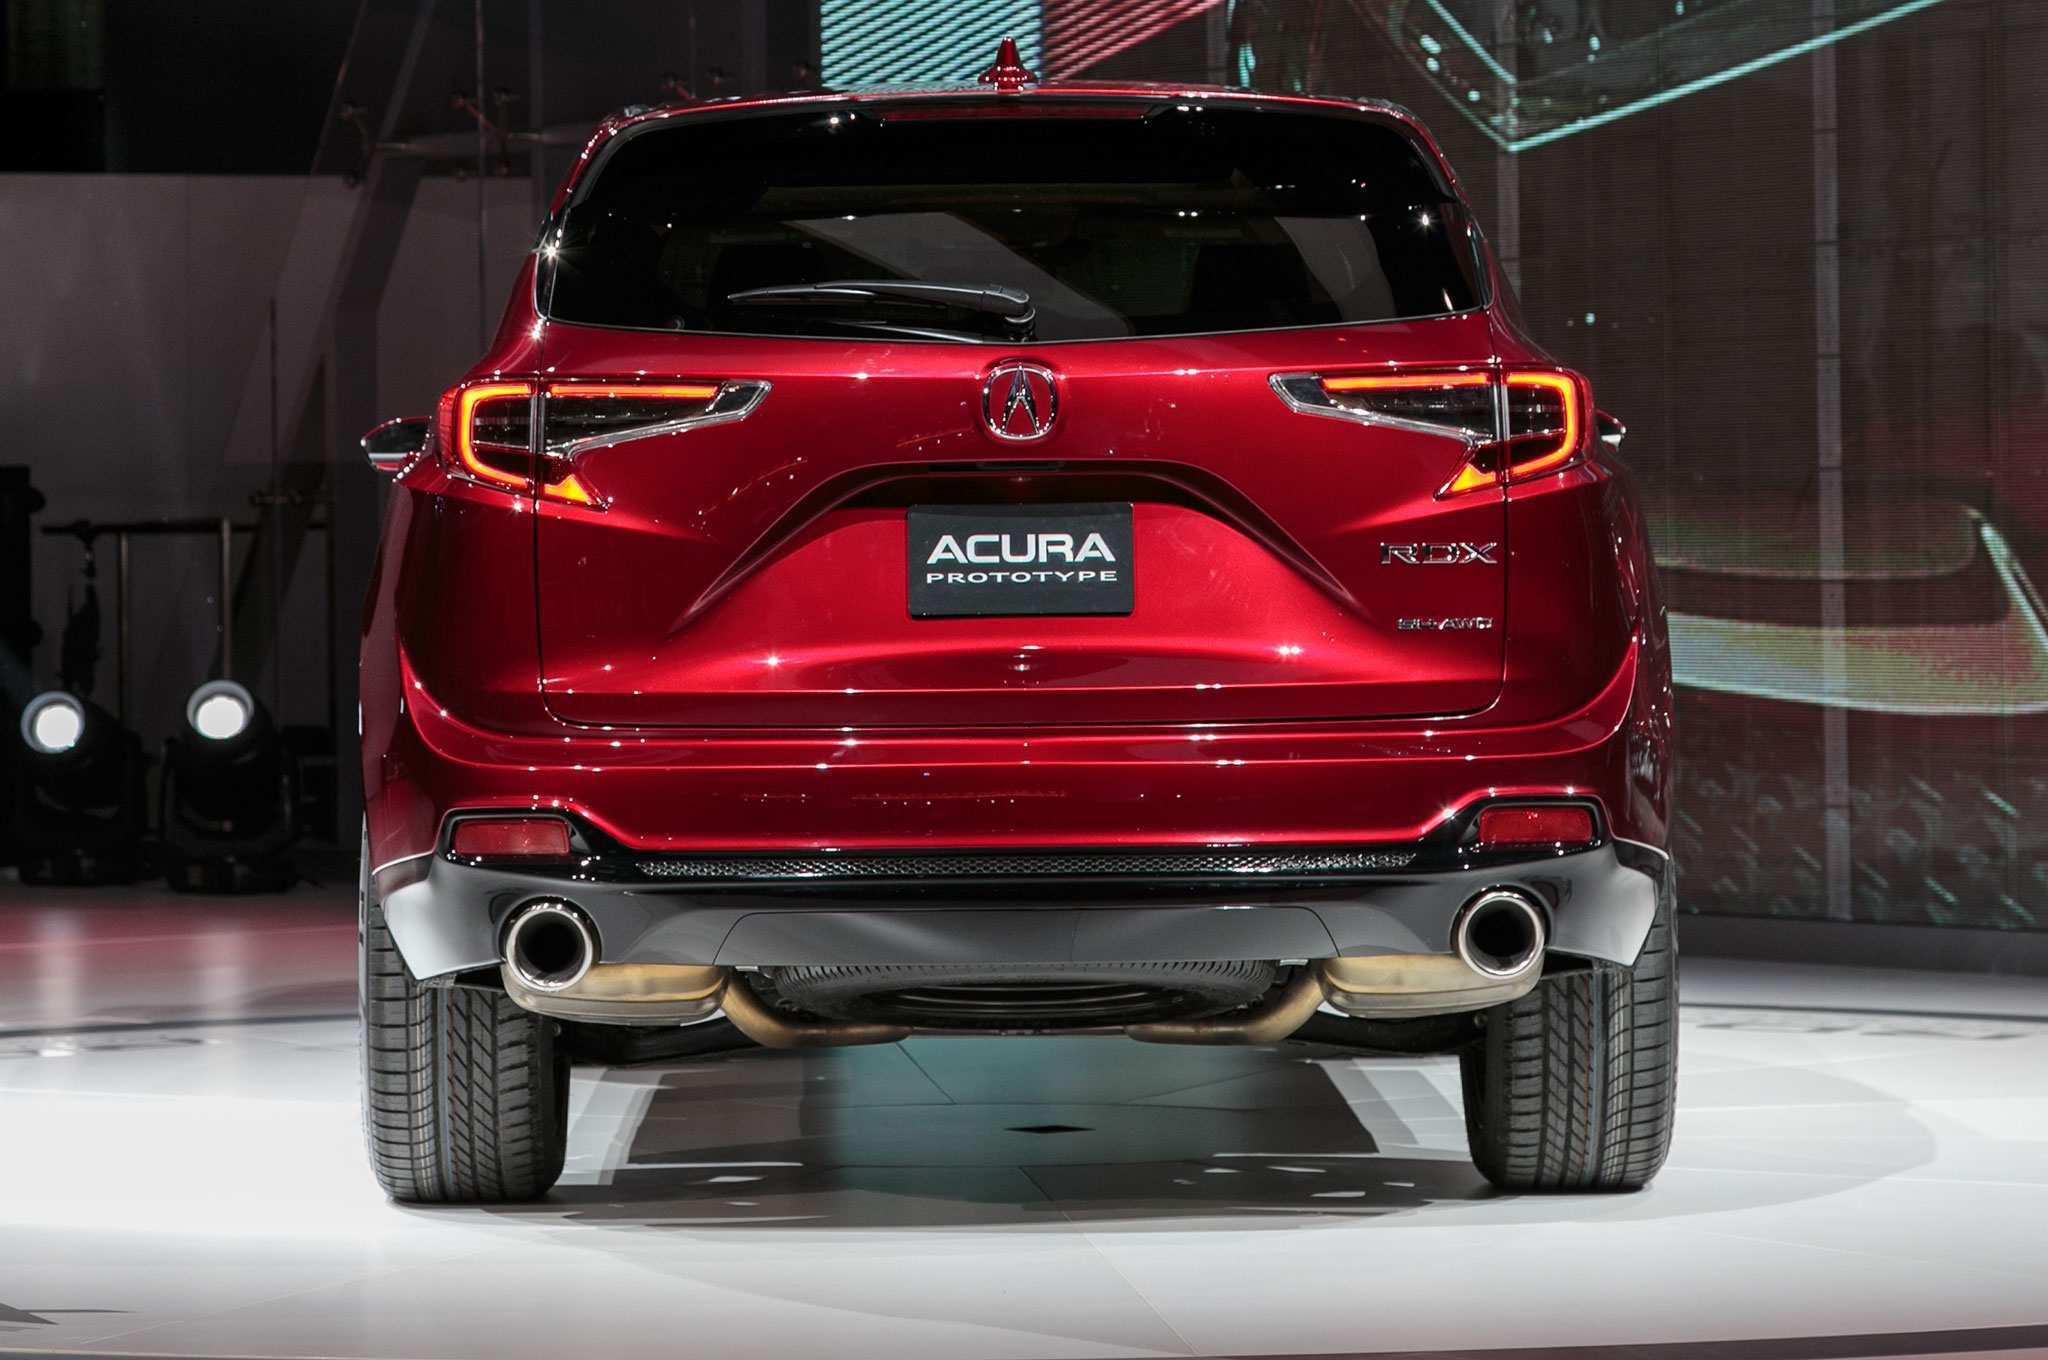 65 New 2019 Acura Rdx Prototype History for 2019 Acura Rdx Prototype